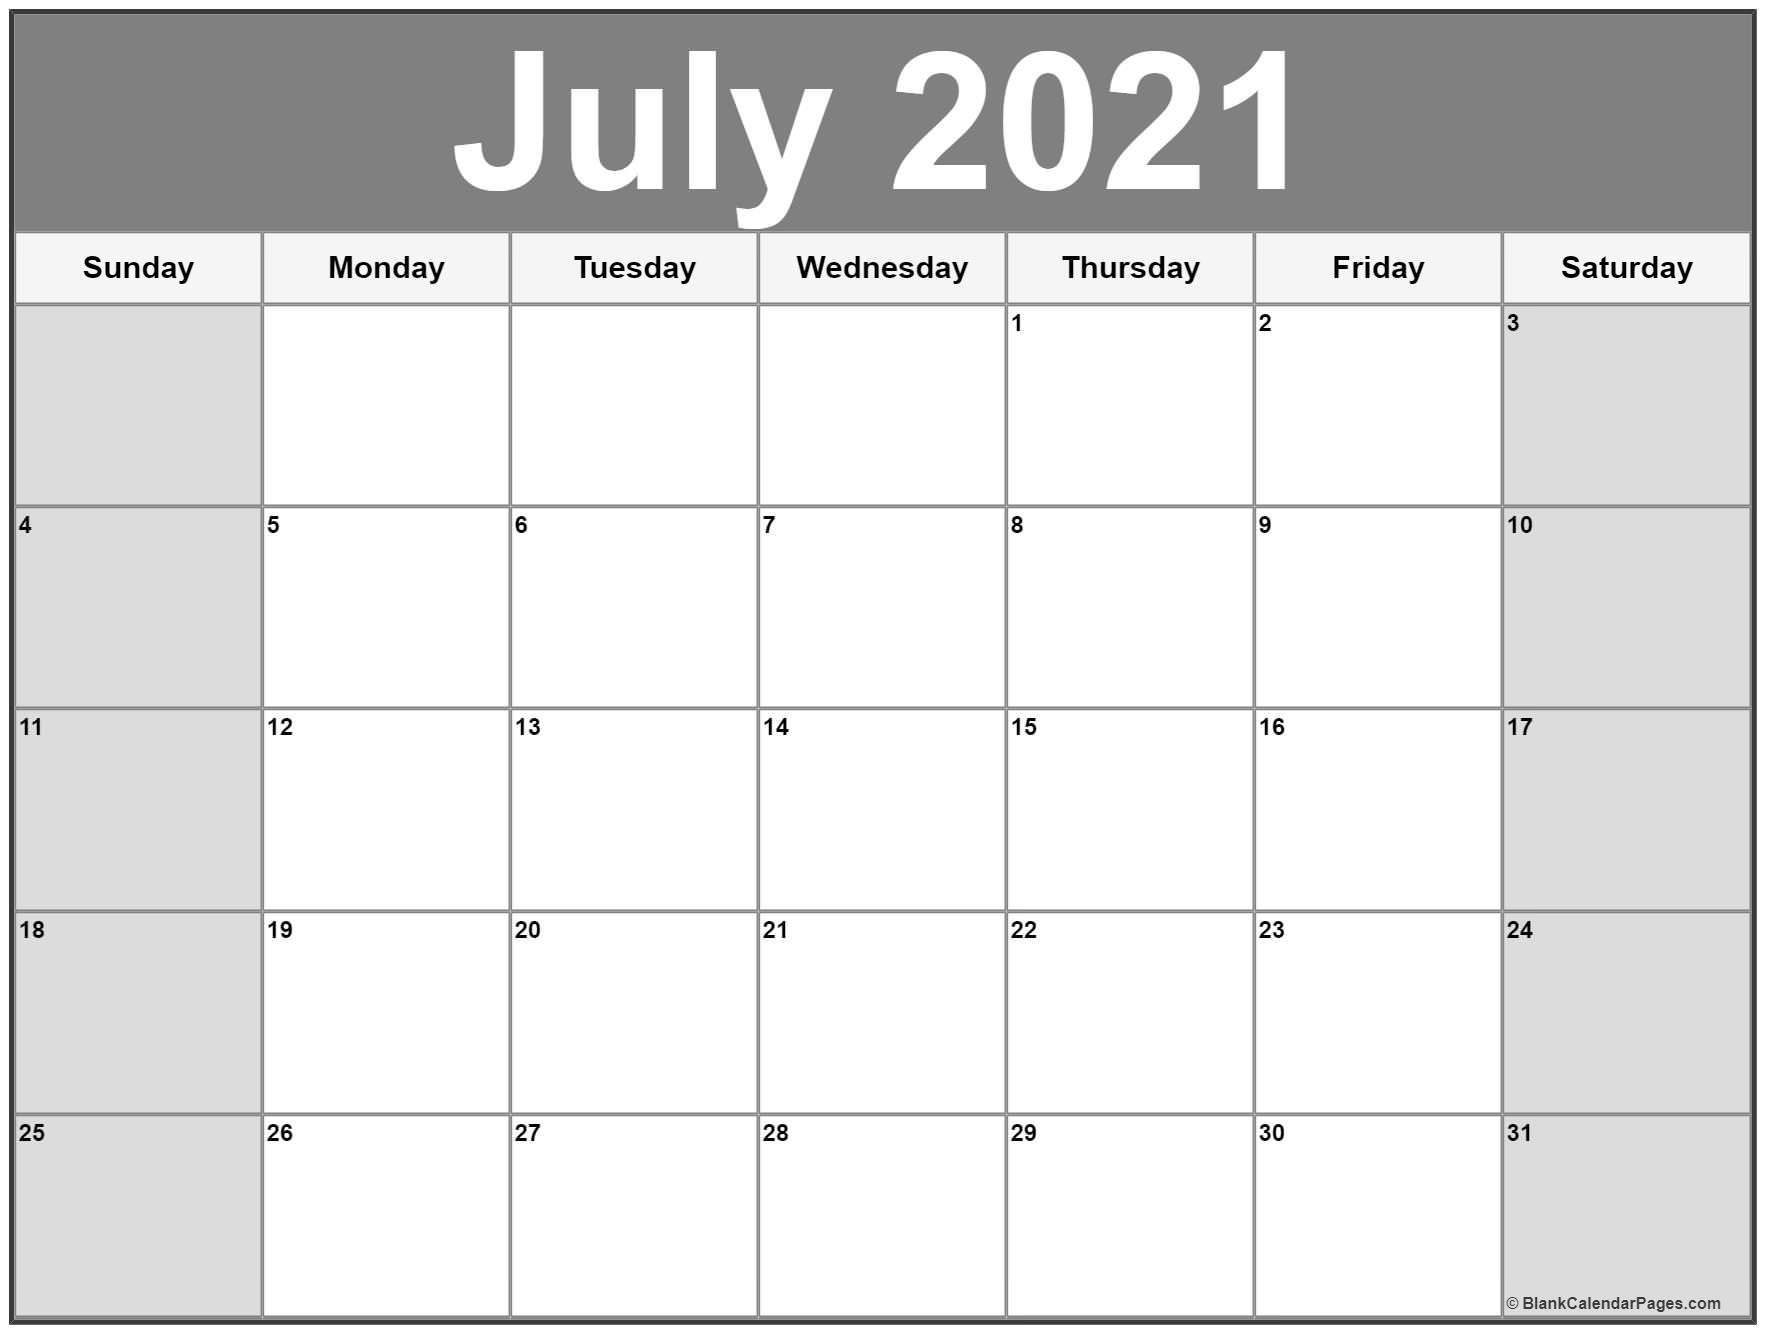 July 2021 Calendar   Free Printable Calendar Month Of July 2021 Calendar